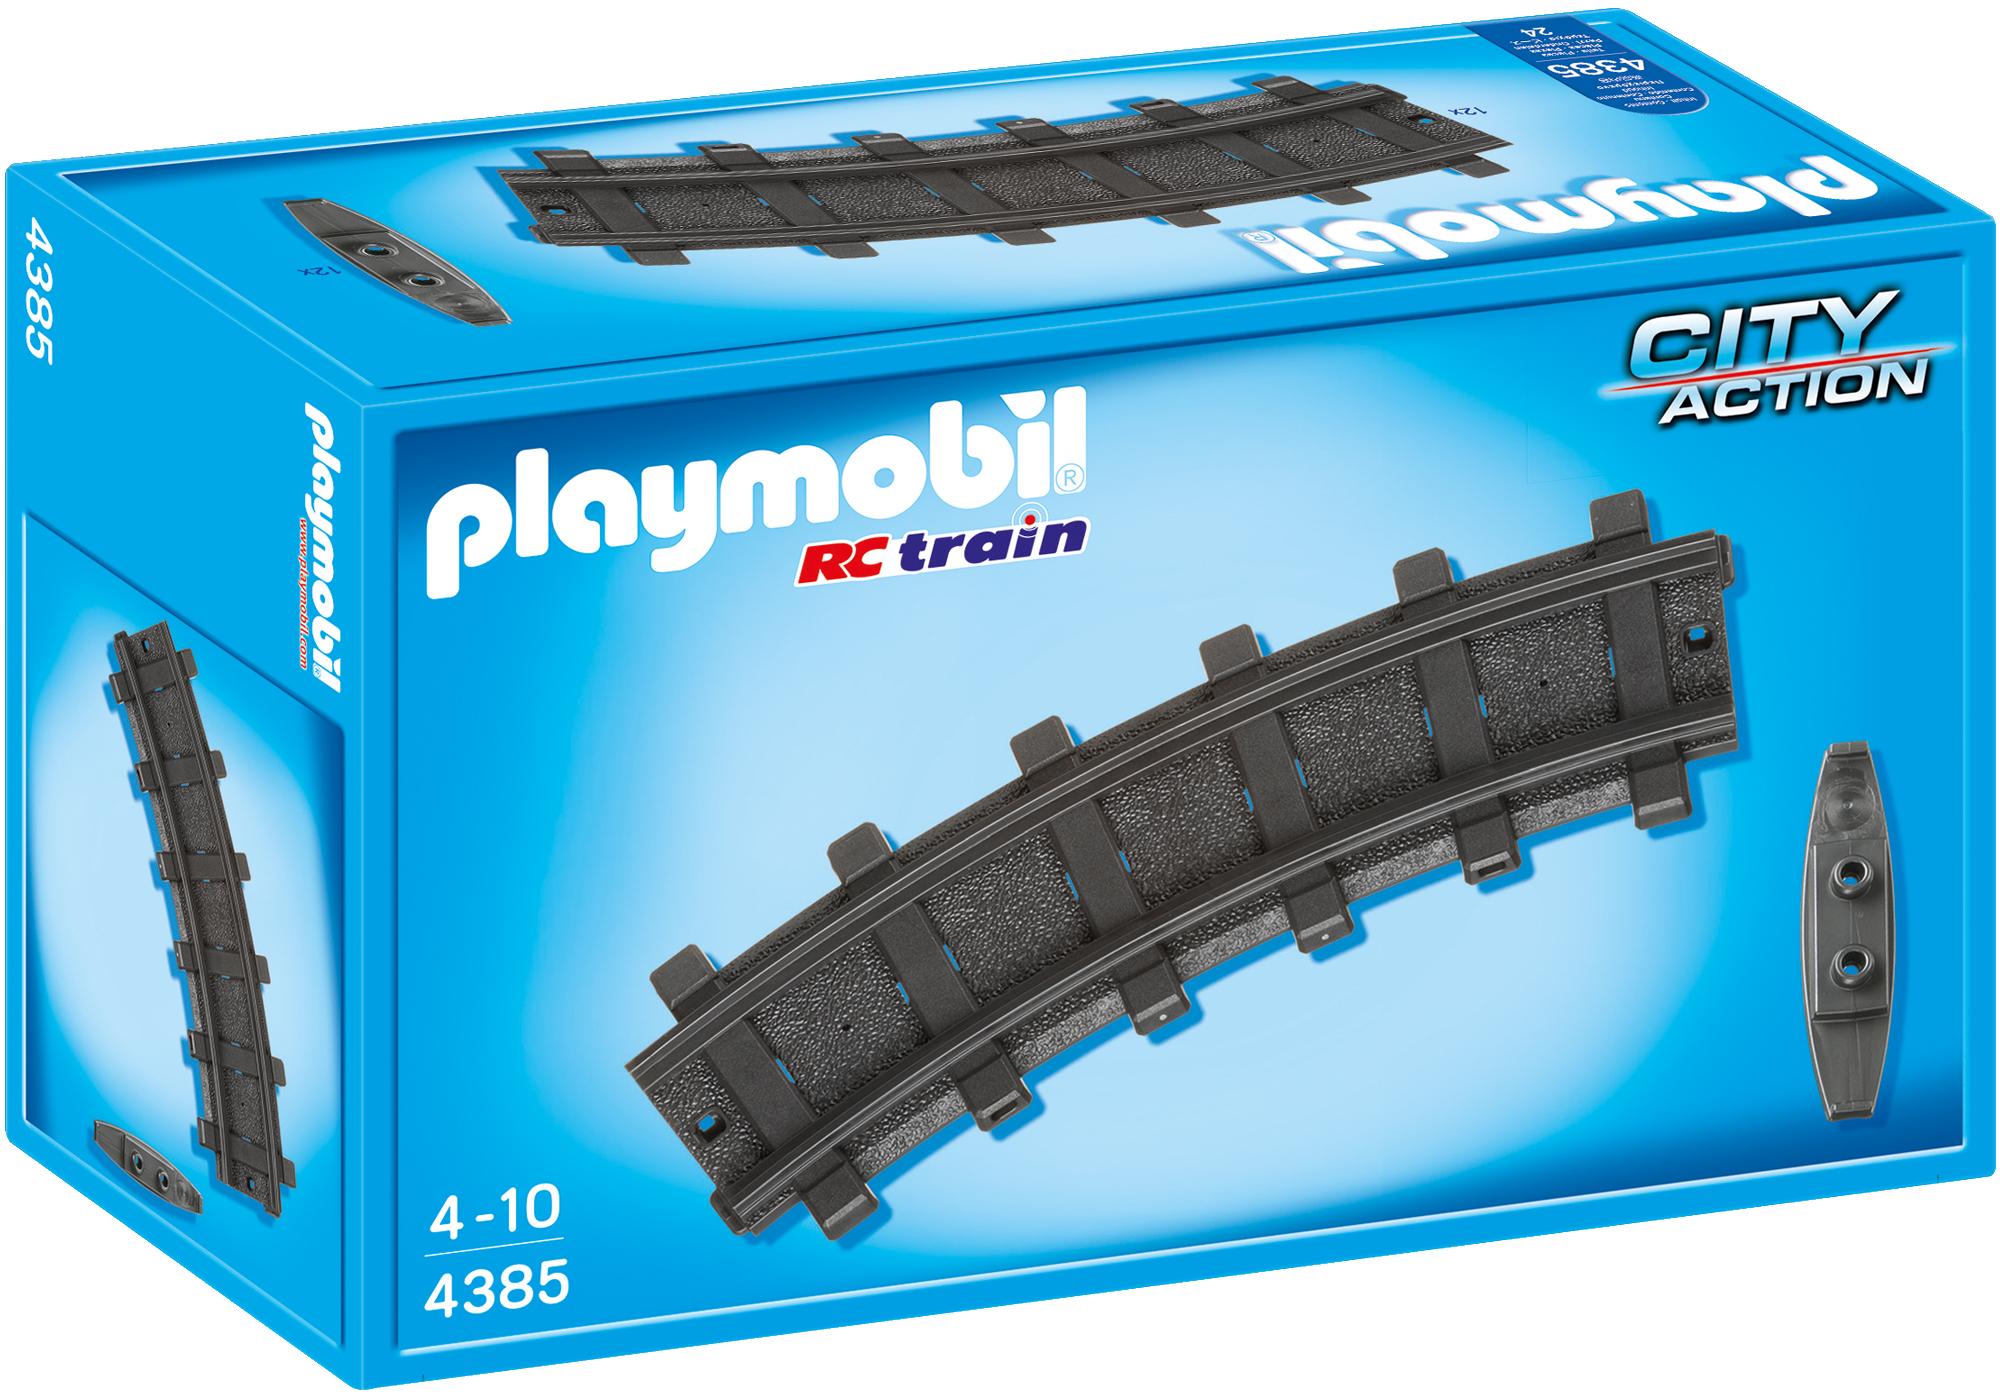 http://media.playmobil.com/i/playmobil/4385_product_box_front/12 Curved Tracks